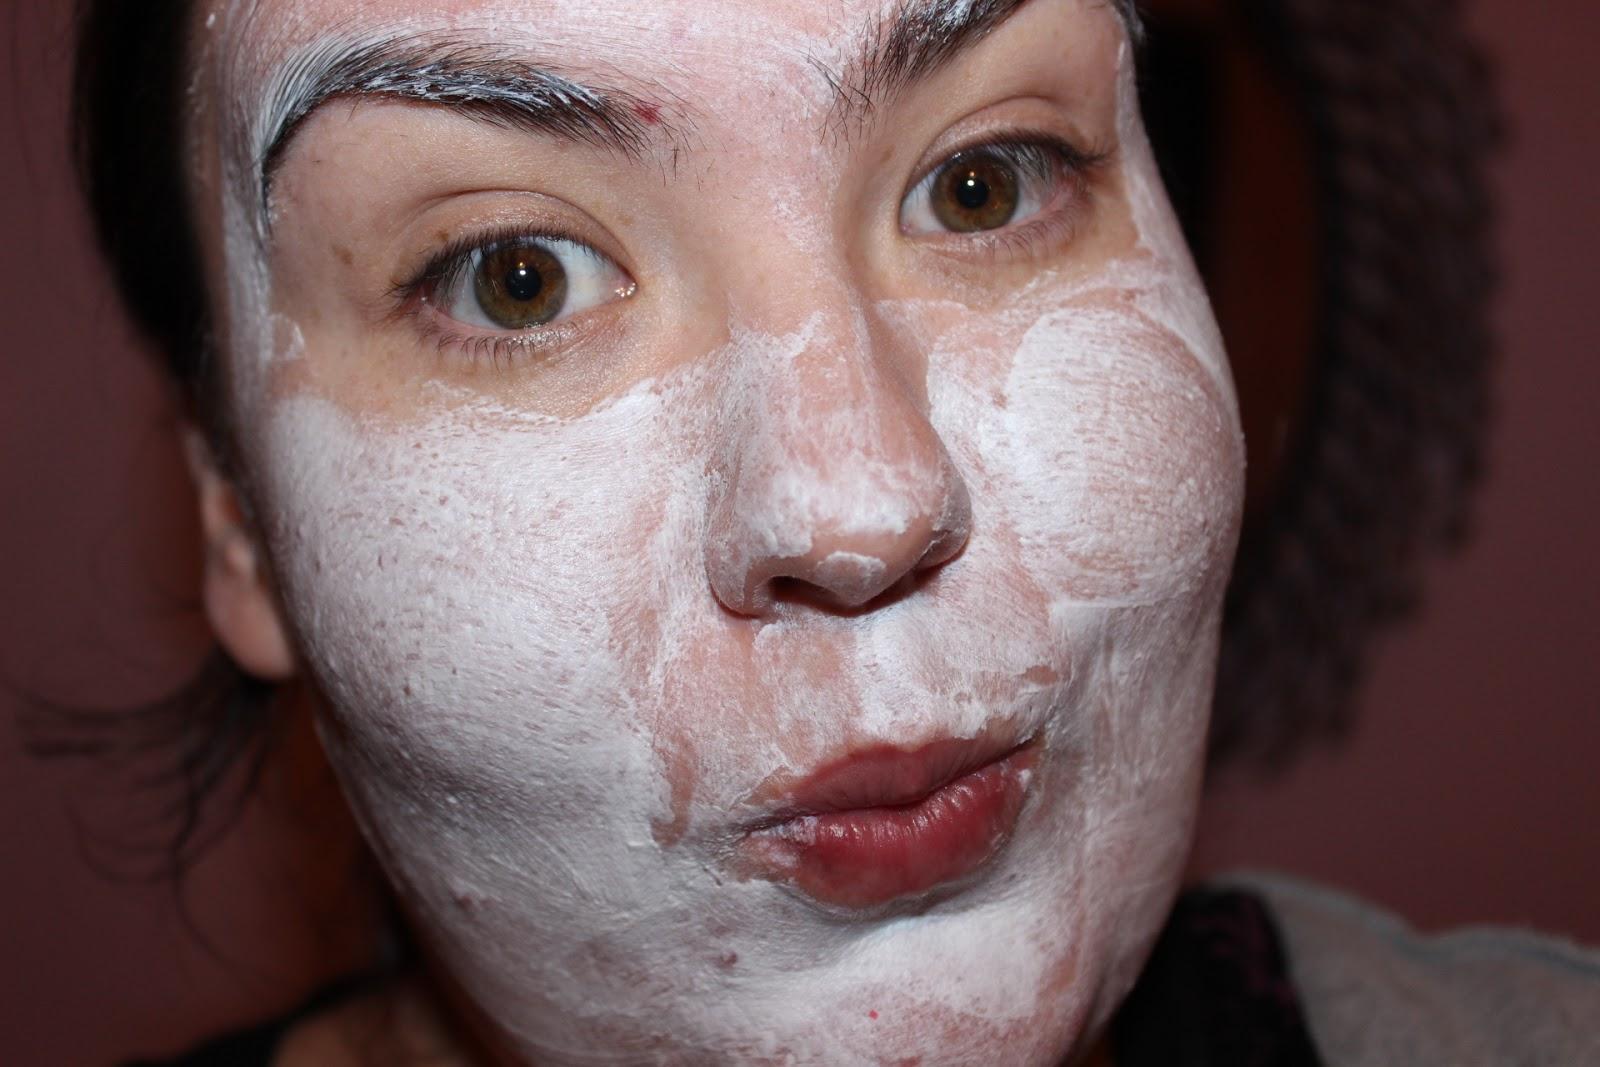 Sephora Pore Clarifying Mask